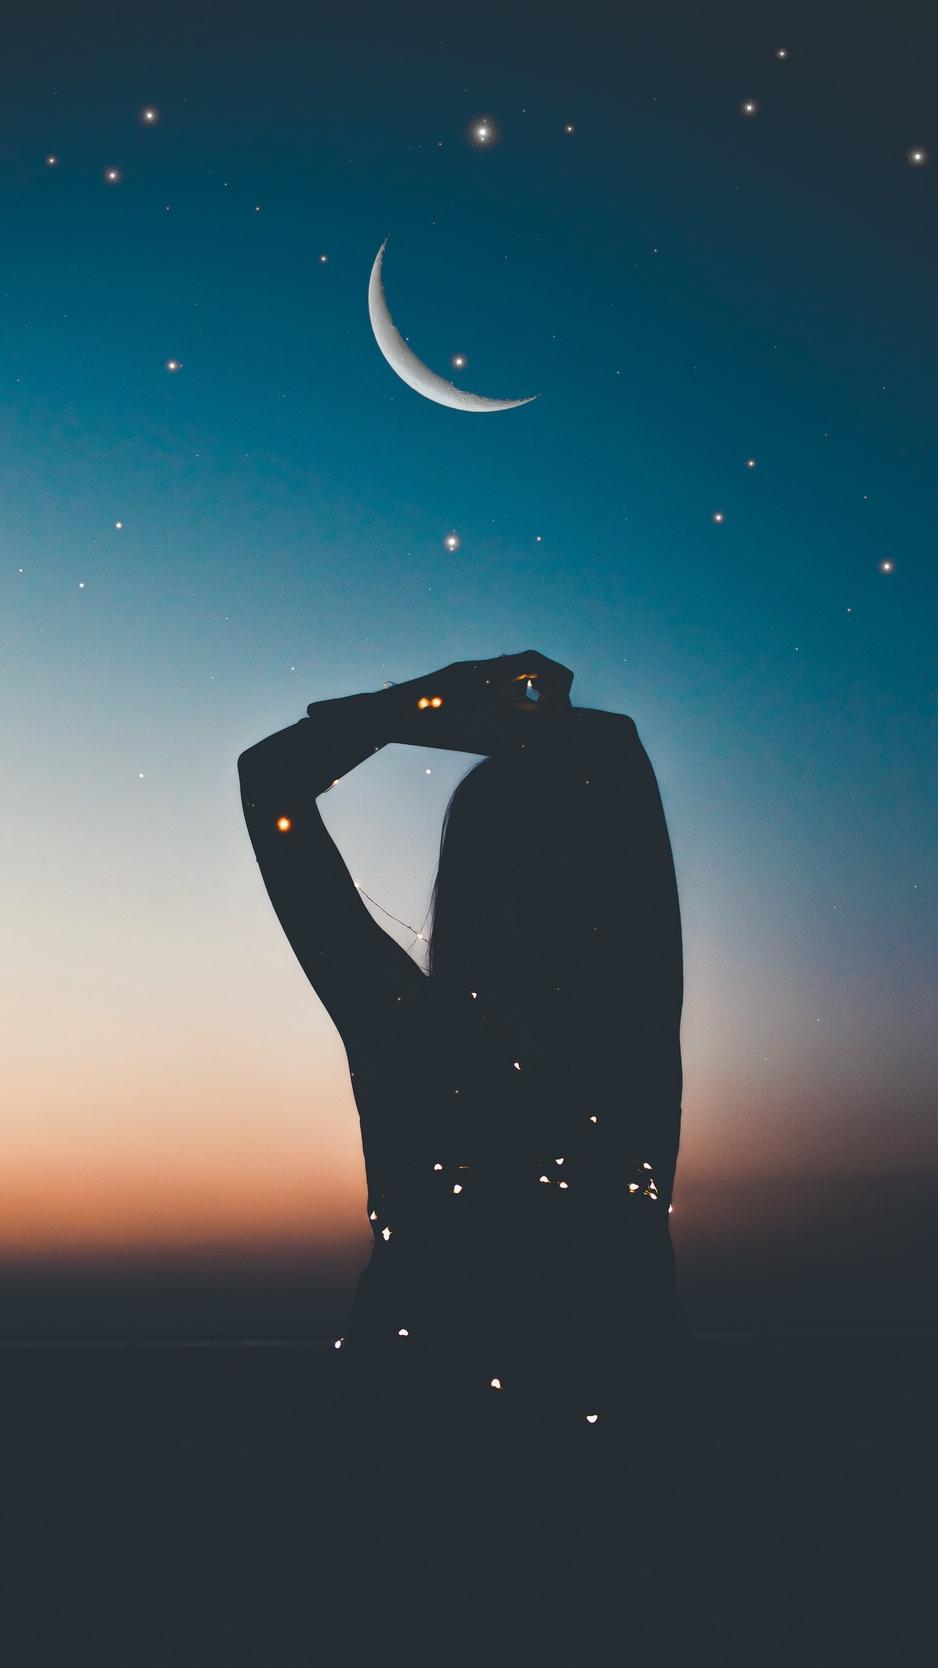 Wallpaper Silhouette Starry Sky Stars Moon Night Night Sky Stars Moon 938x1668 Wallpaper Teahub Io